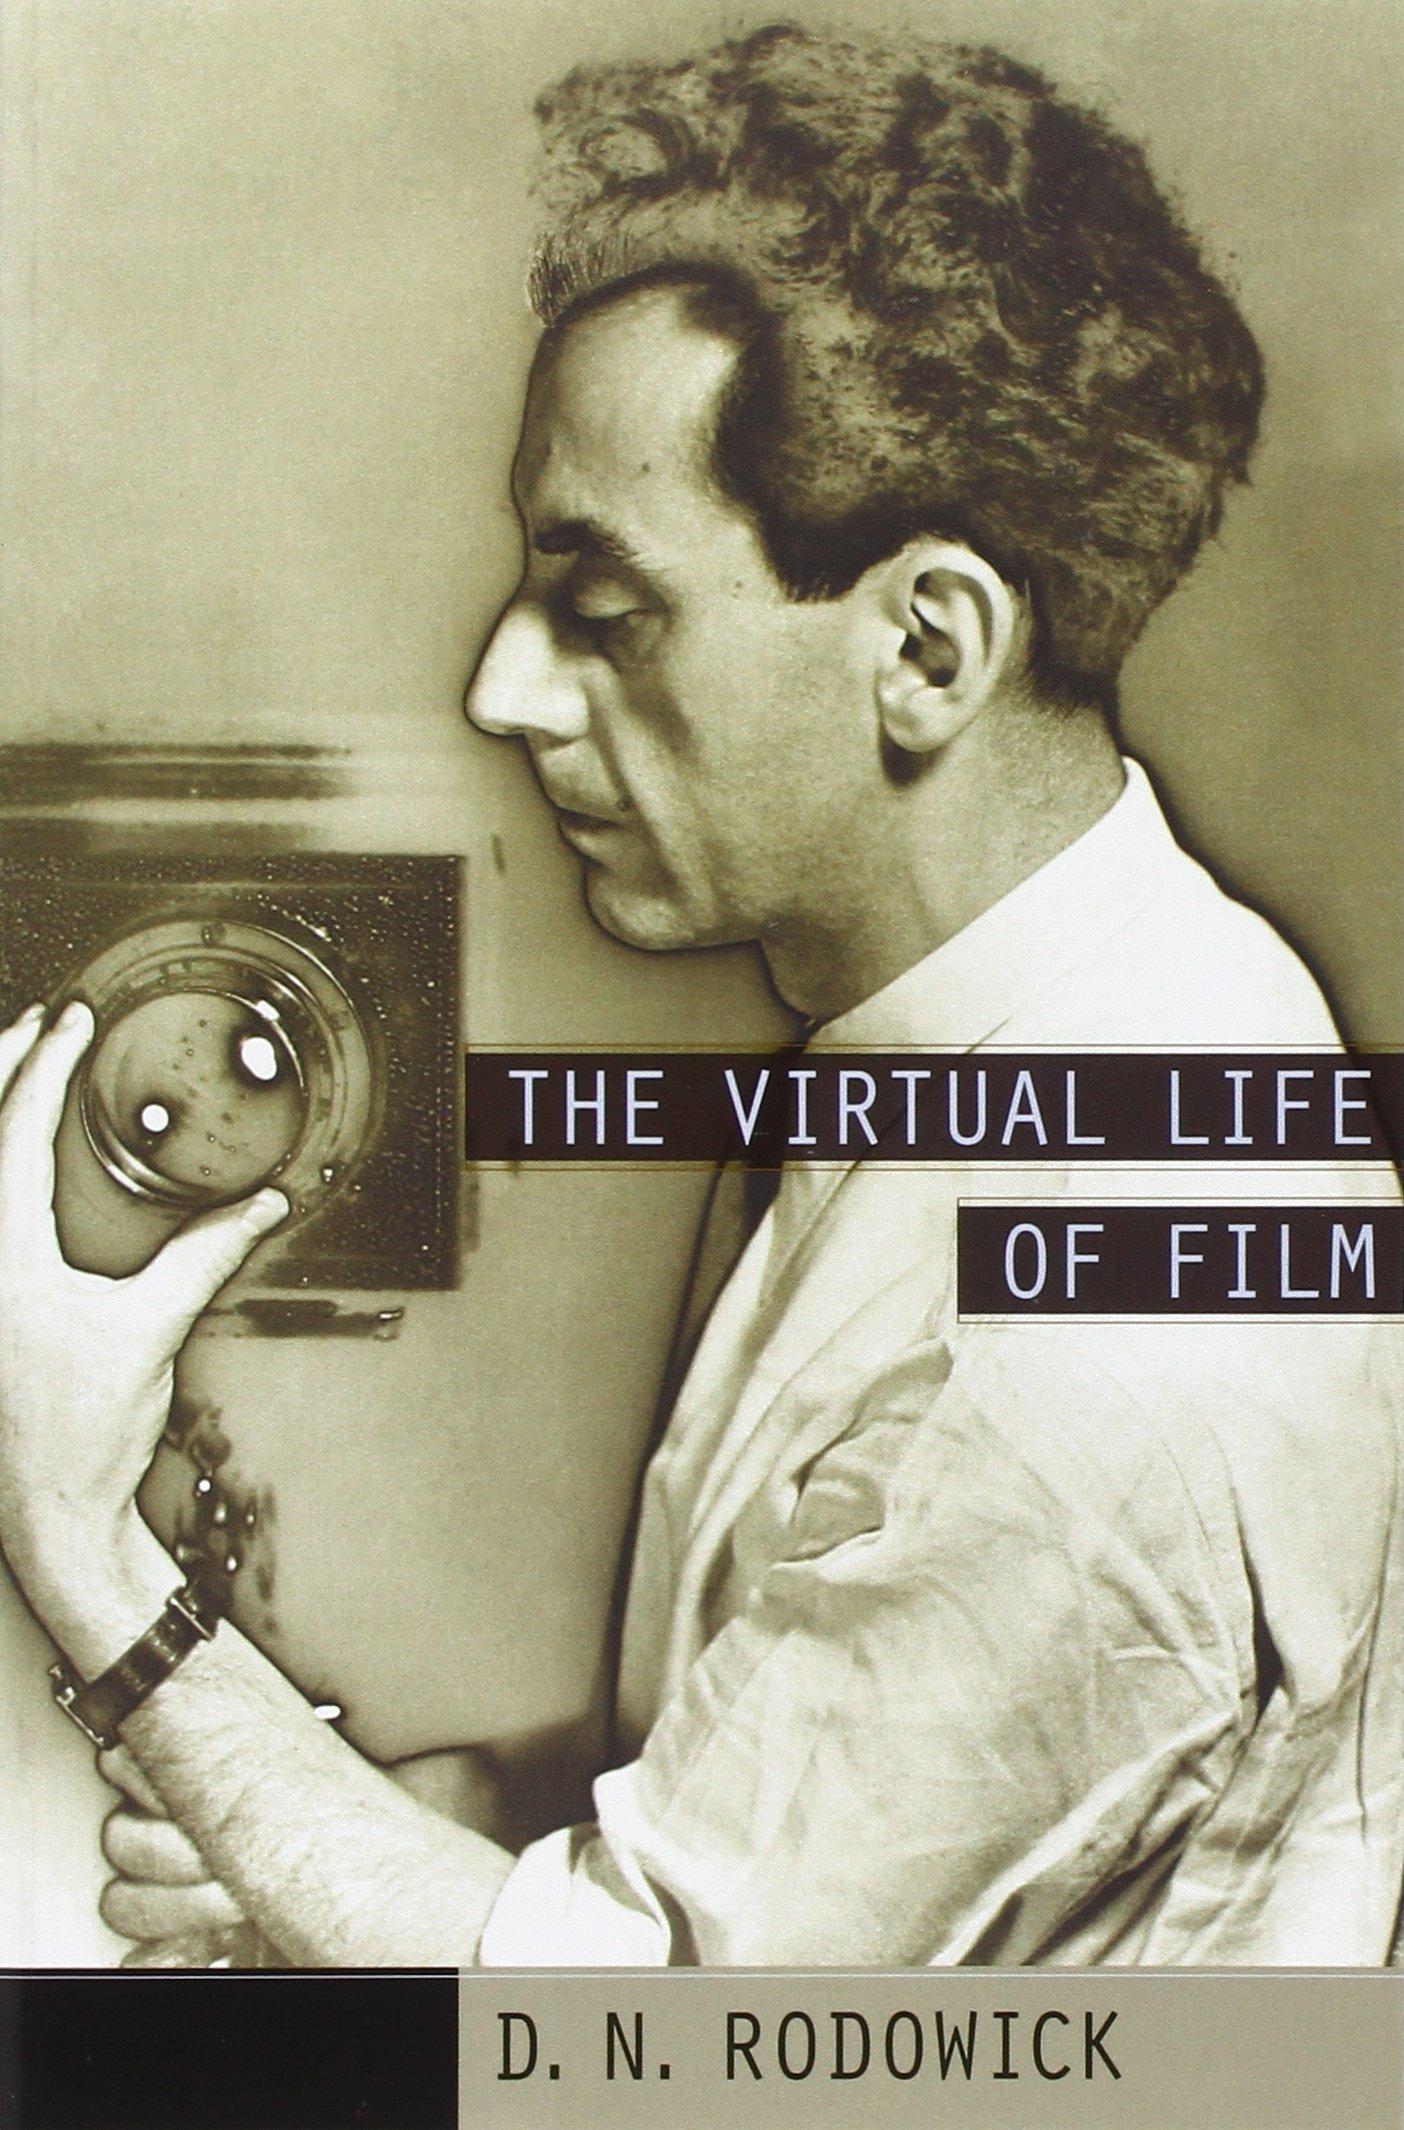 Buy The Virtual Life of Film